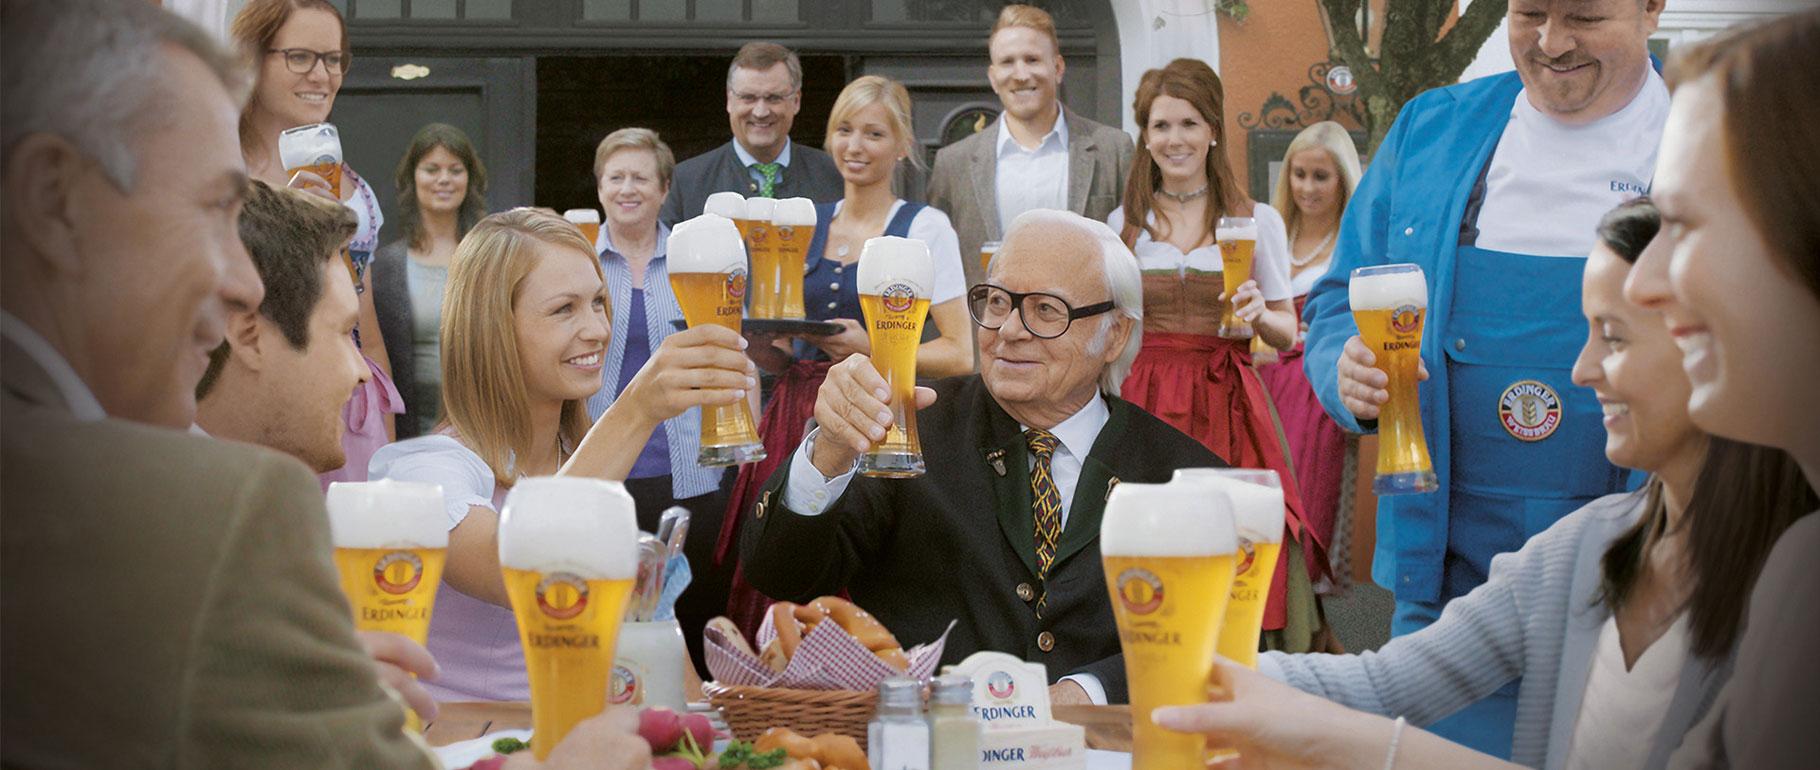 ERDINGER Weißbräu celebrates anniversary